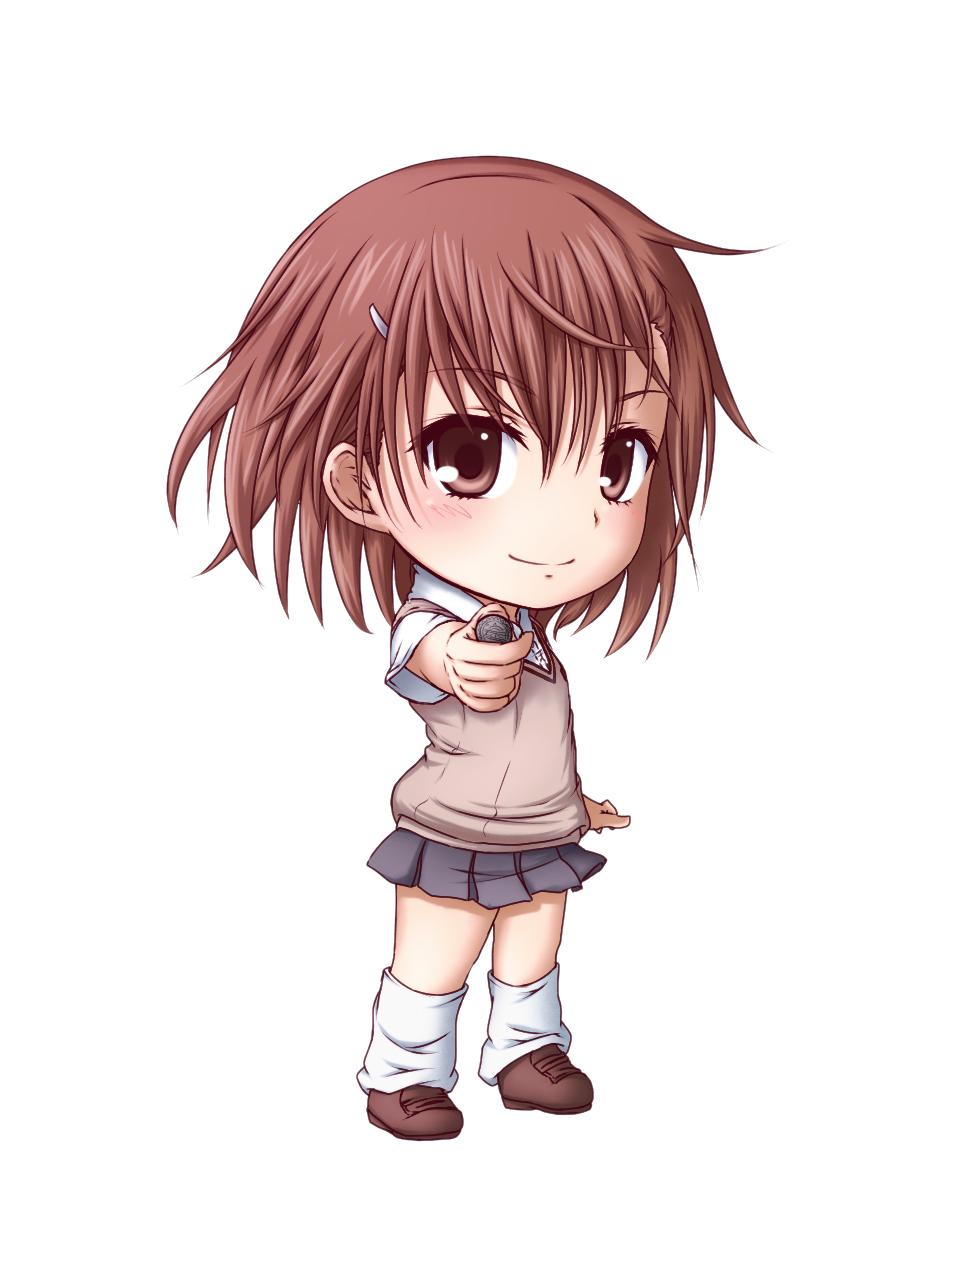 misaka mikoto anime girls - photo #35